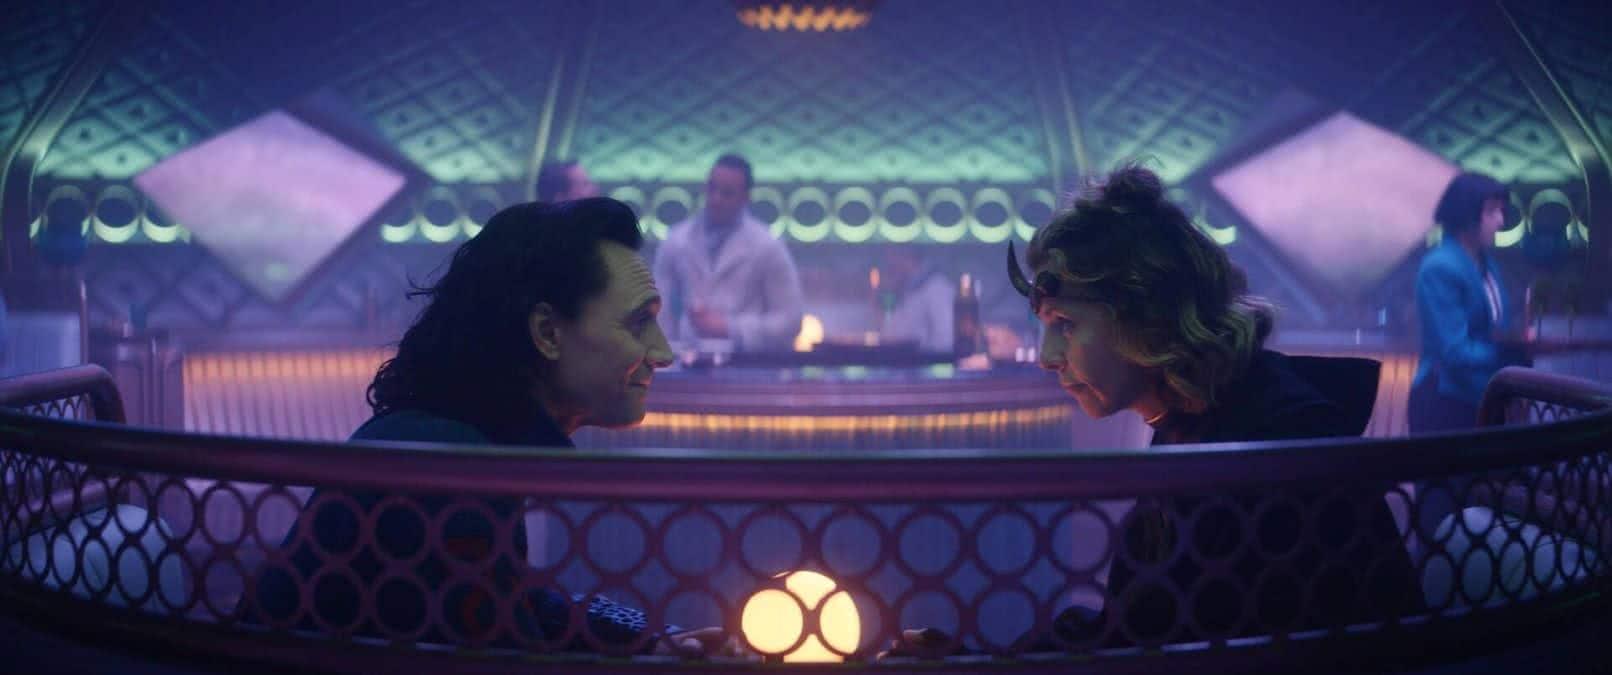 Loki (Tom Hiddleston) e Sylvie (Sophia Di Martino) em Loki (Reprodução / Disney+)